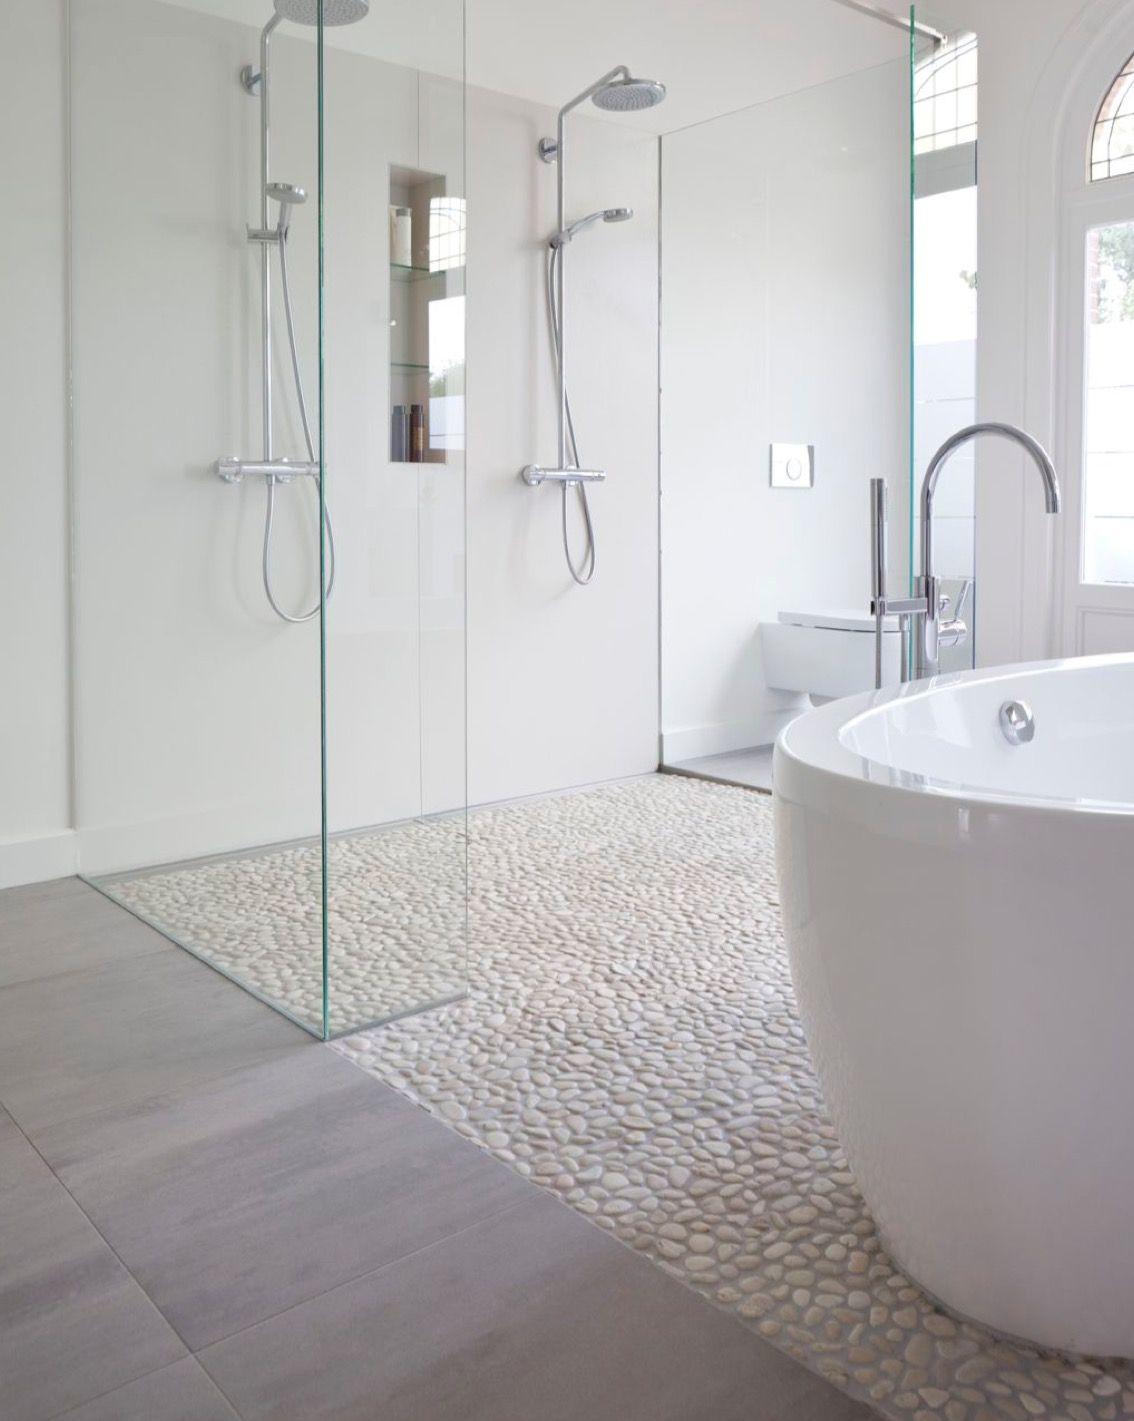 Pin by maa on Bathrooms | Pinterest | Bath ideas, Bath and Master ...